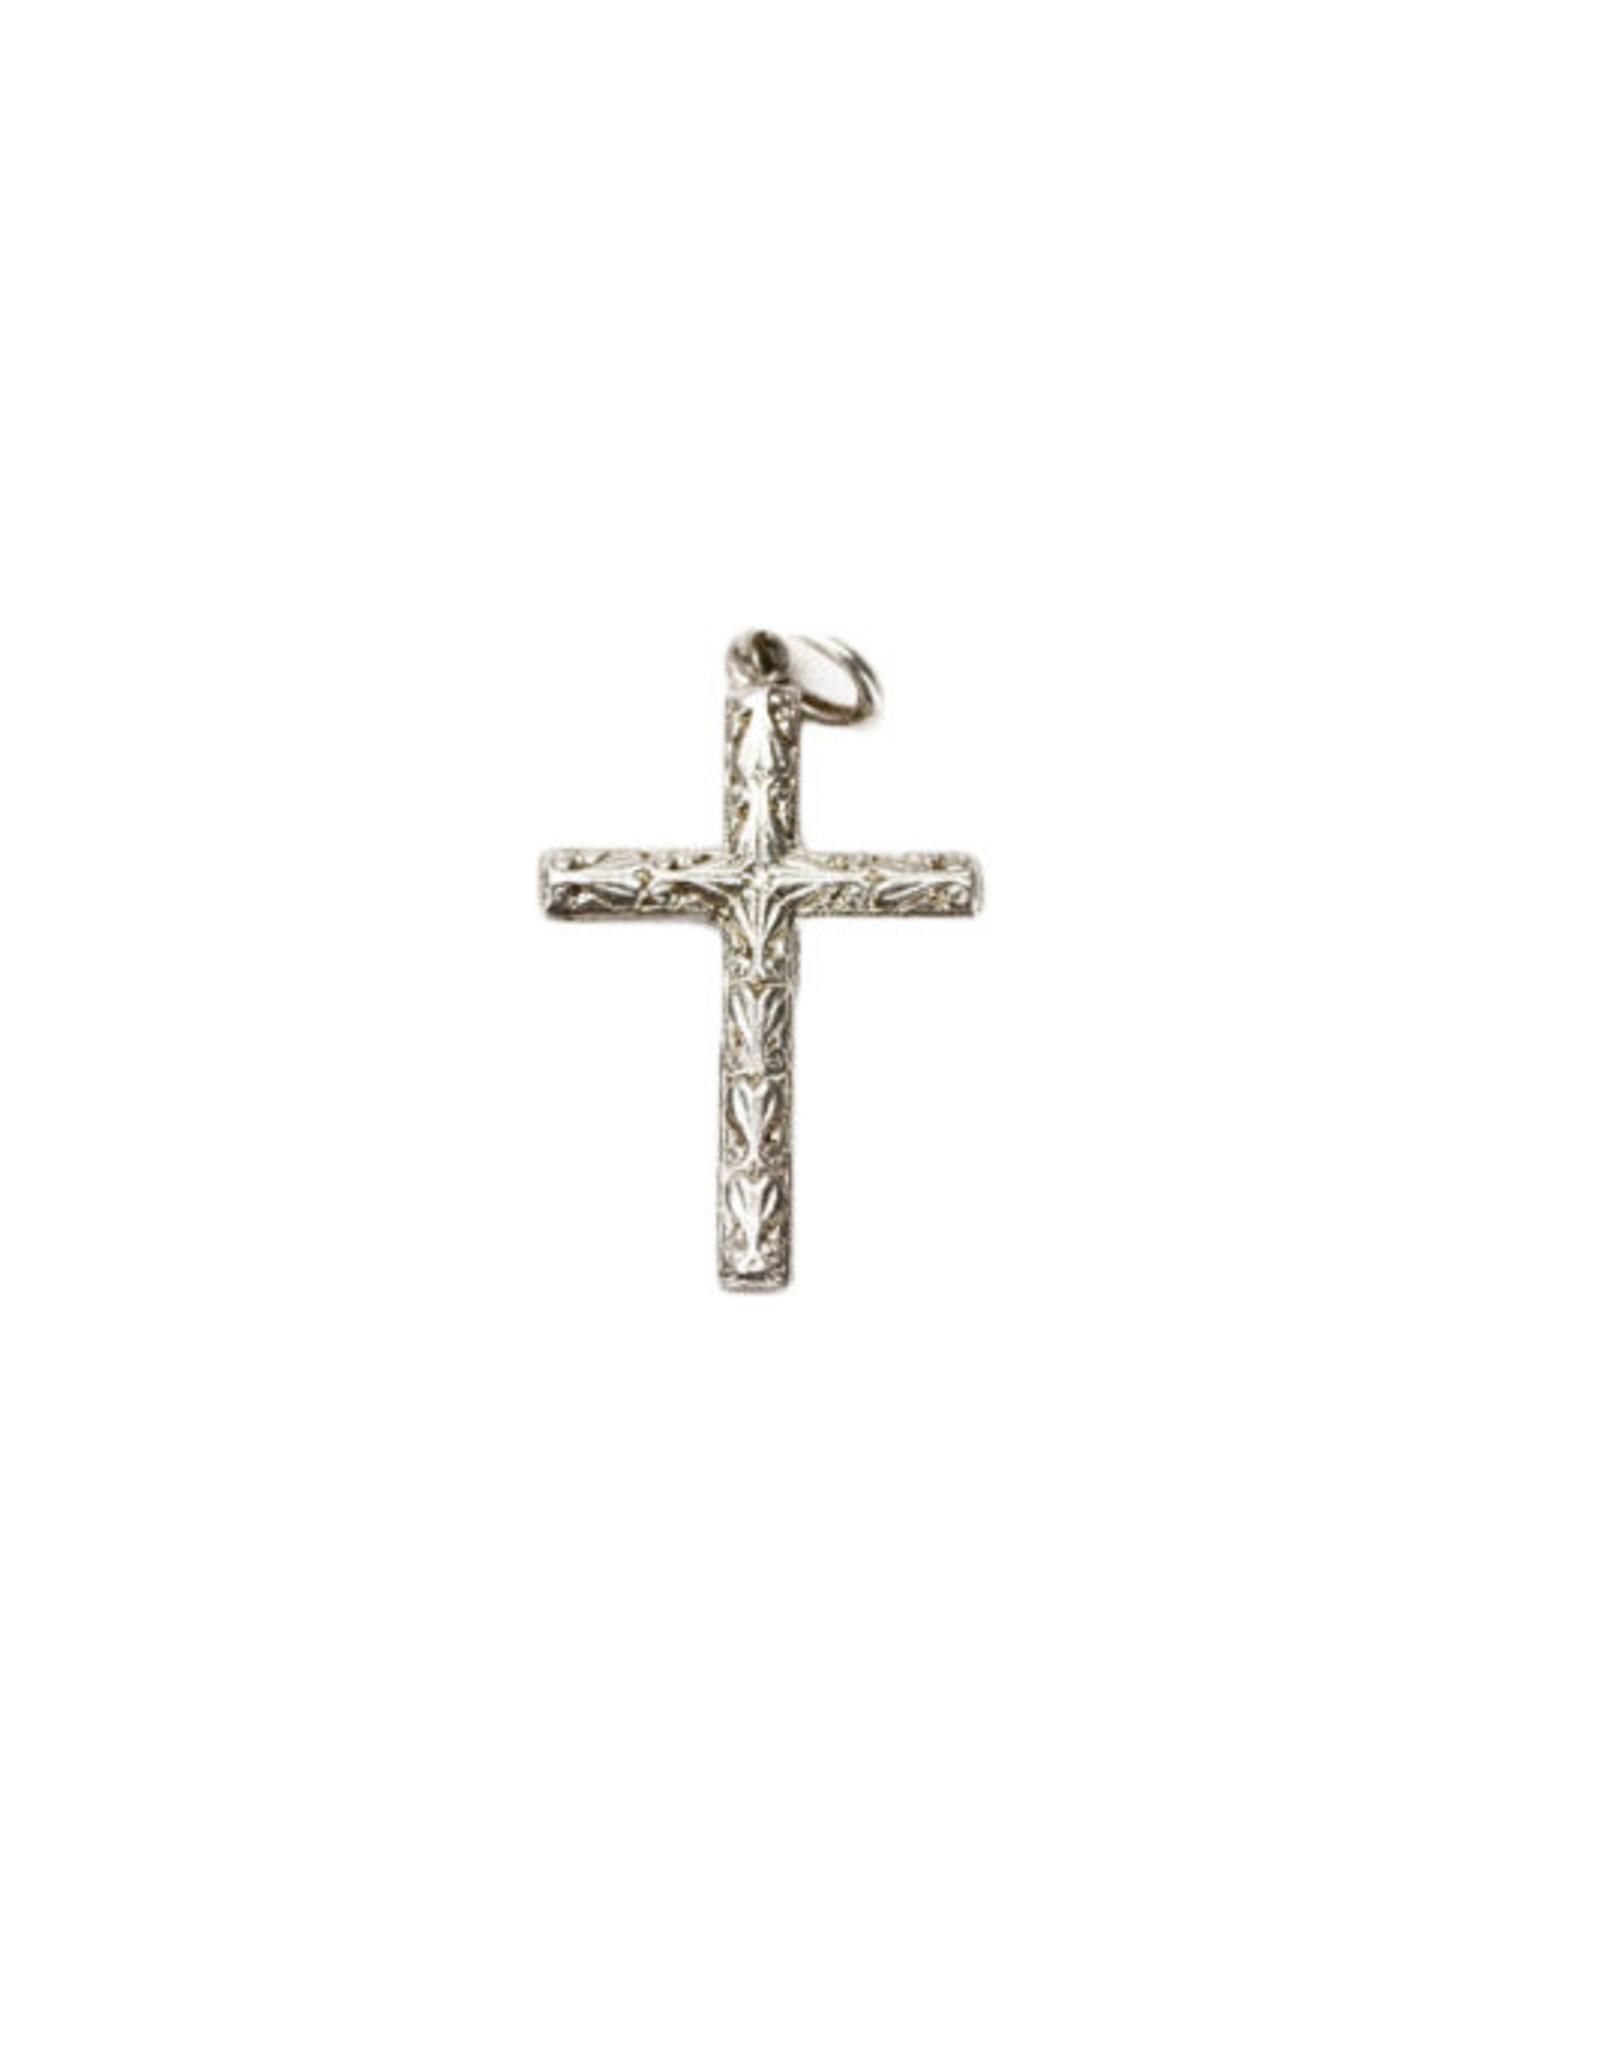 Silver Cross, 925 sterling